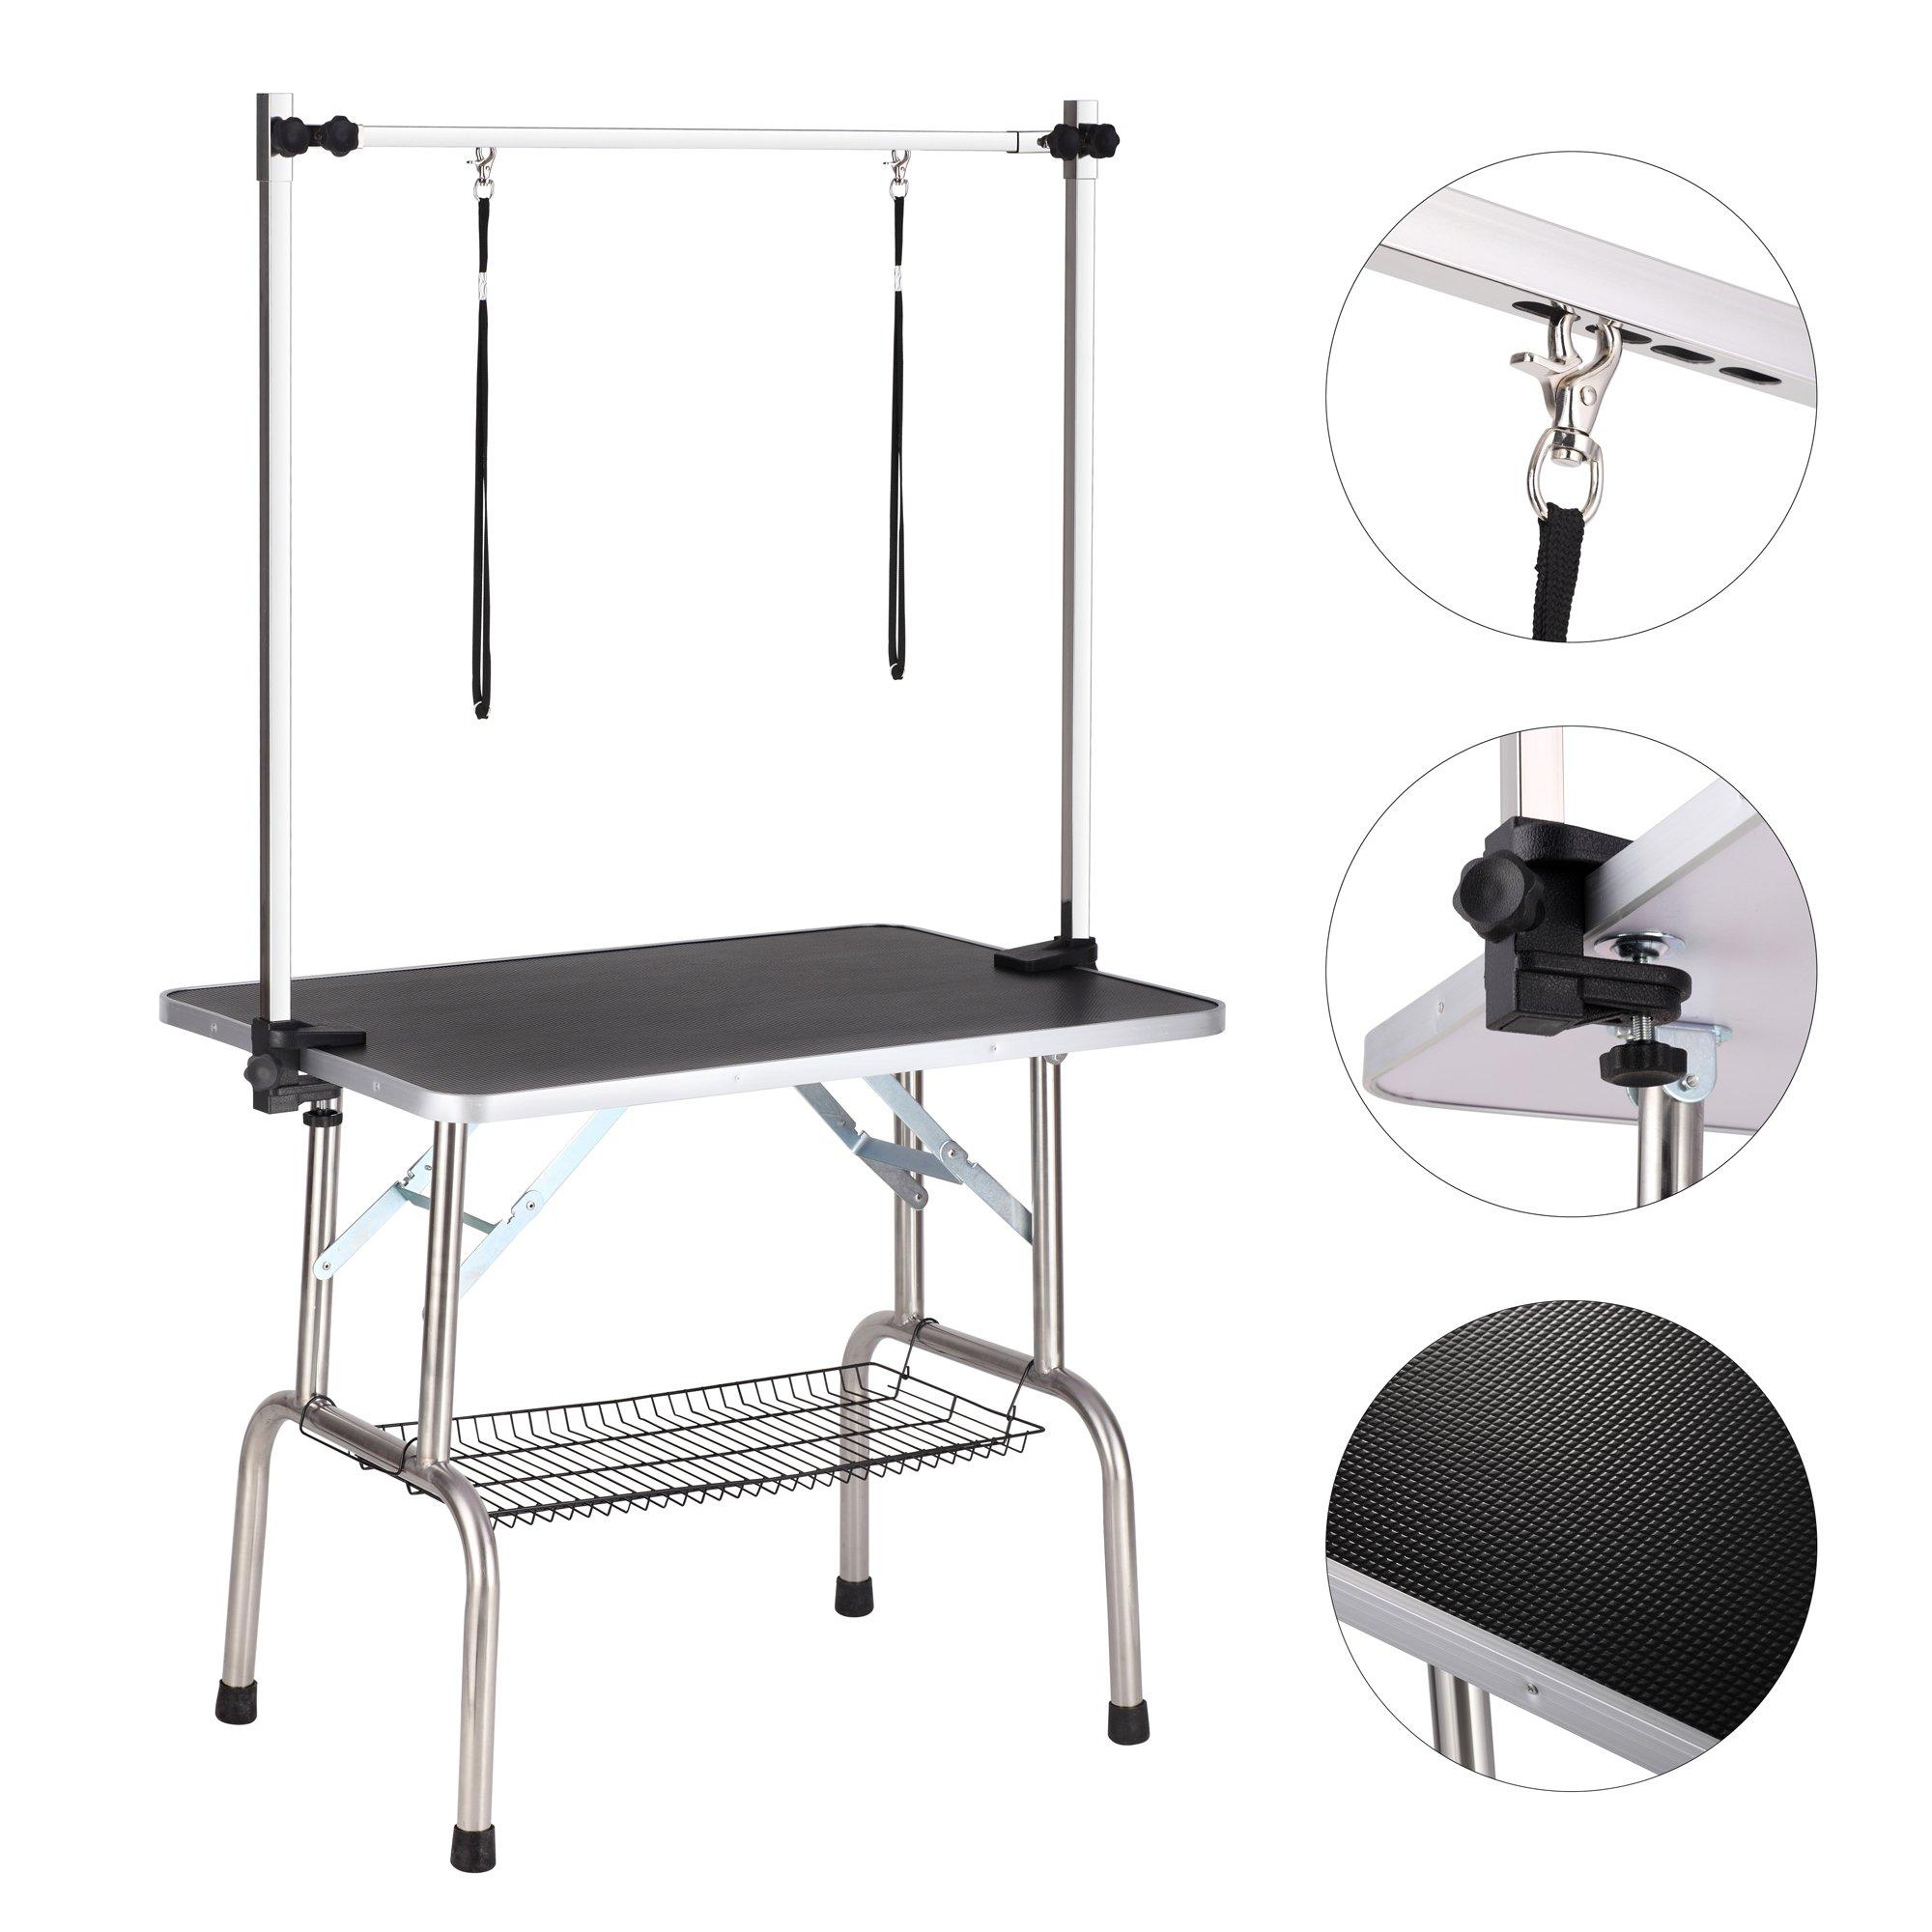 Haige Pet Dog Grooming Table, Adjustable Clamp Overhead Pet Grooming Arm with Double Grooming Loop (36'' by 24'') Black